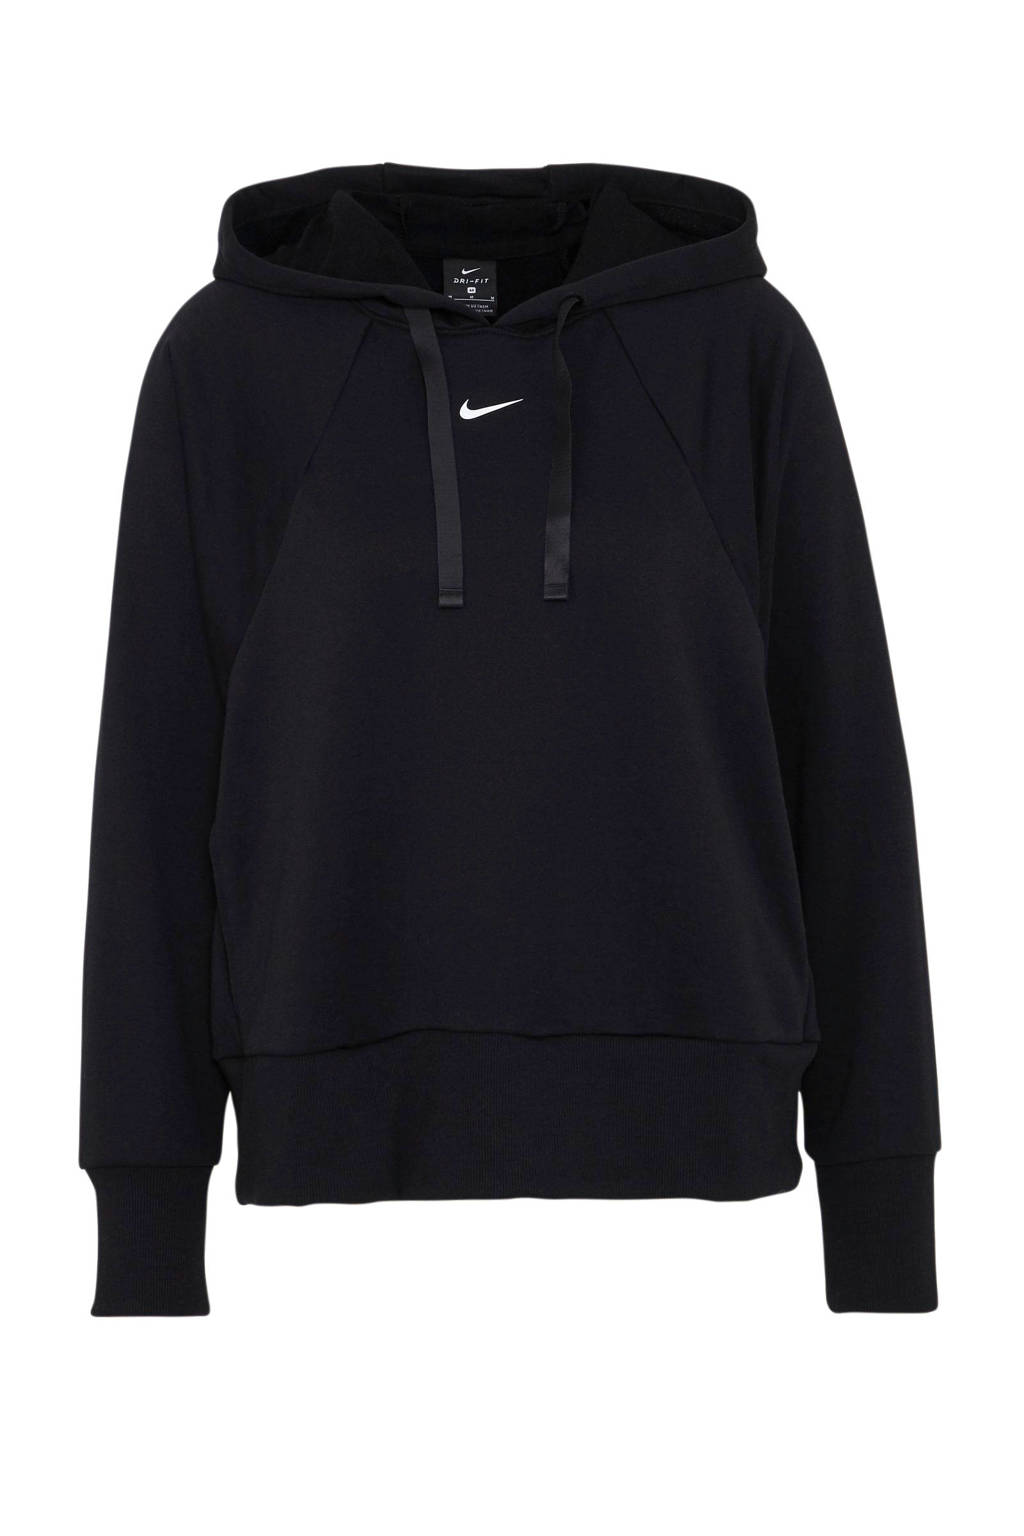 Nike Pro sportsweater zwart, Zwart/wit